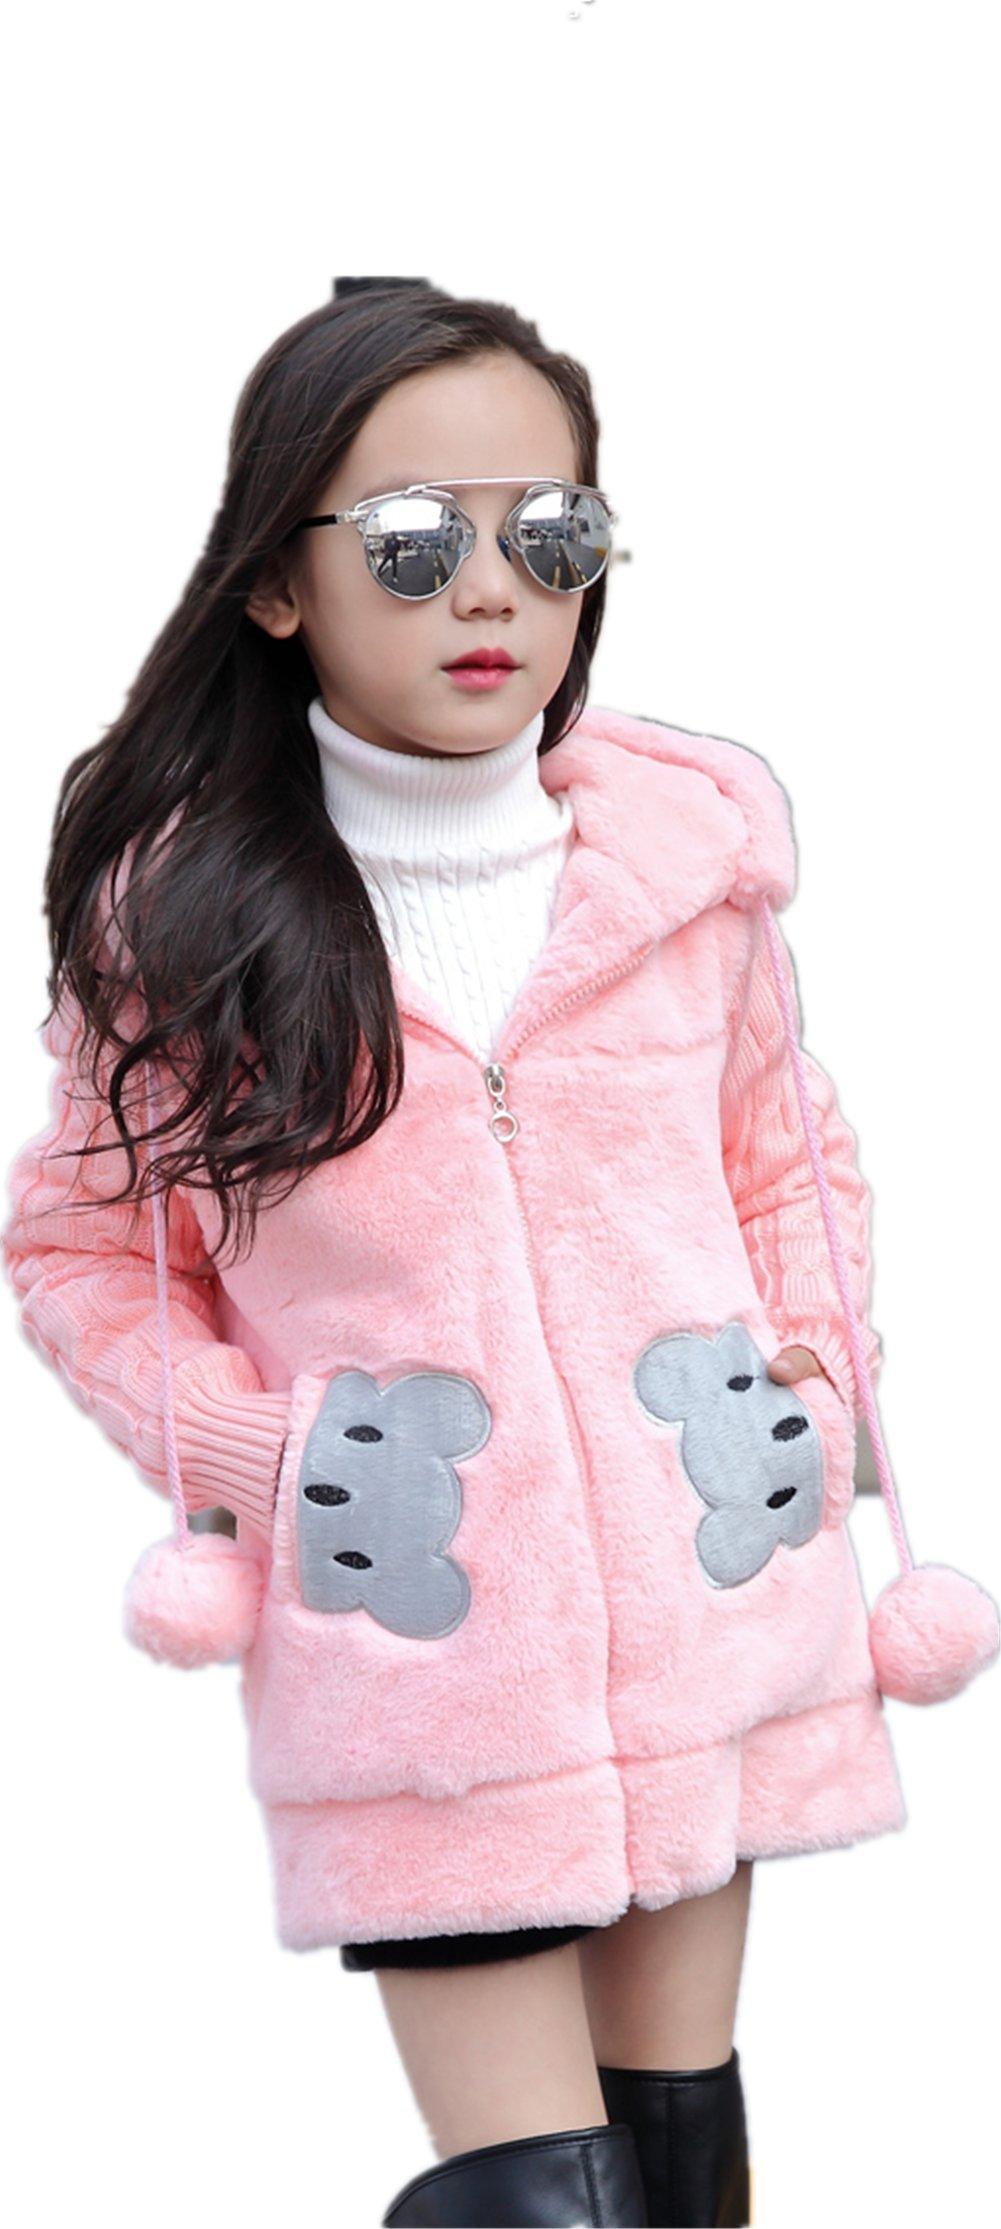 Face Dream Kids Girls Winter Warm Knited Fur Cartoon Coats Hooded Snowsuit Jackets Outerwear